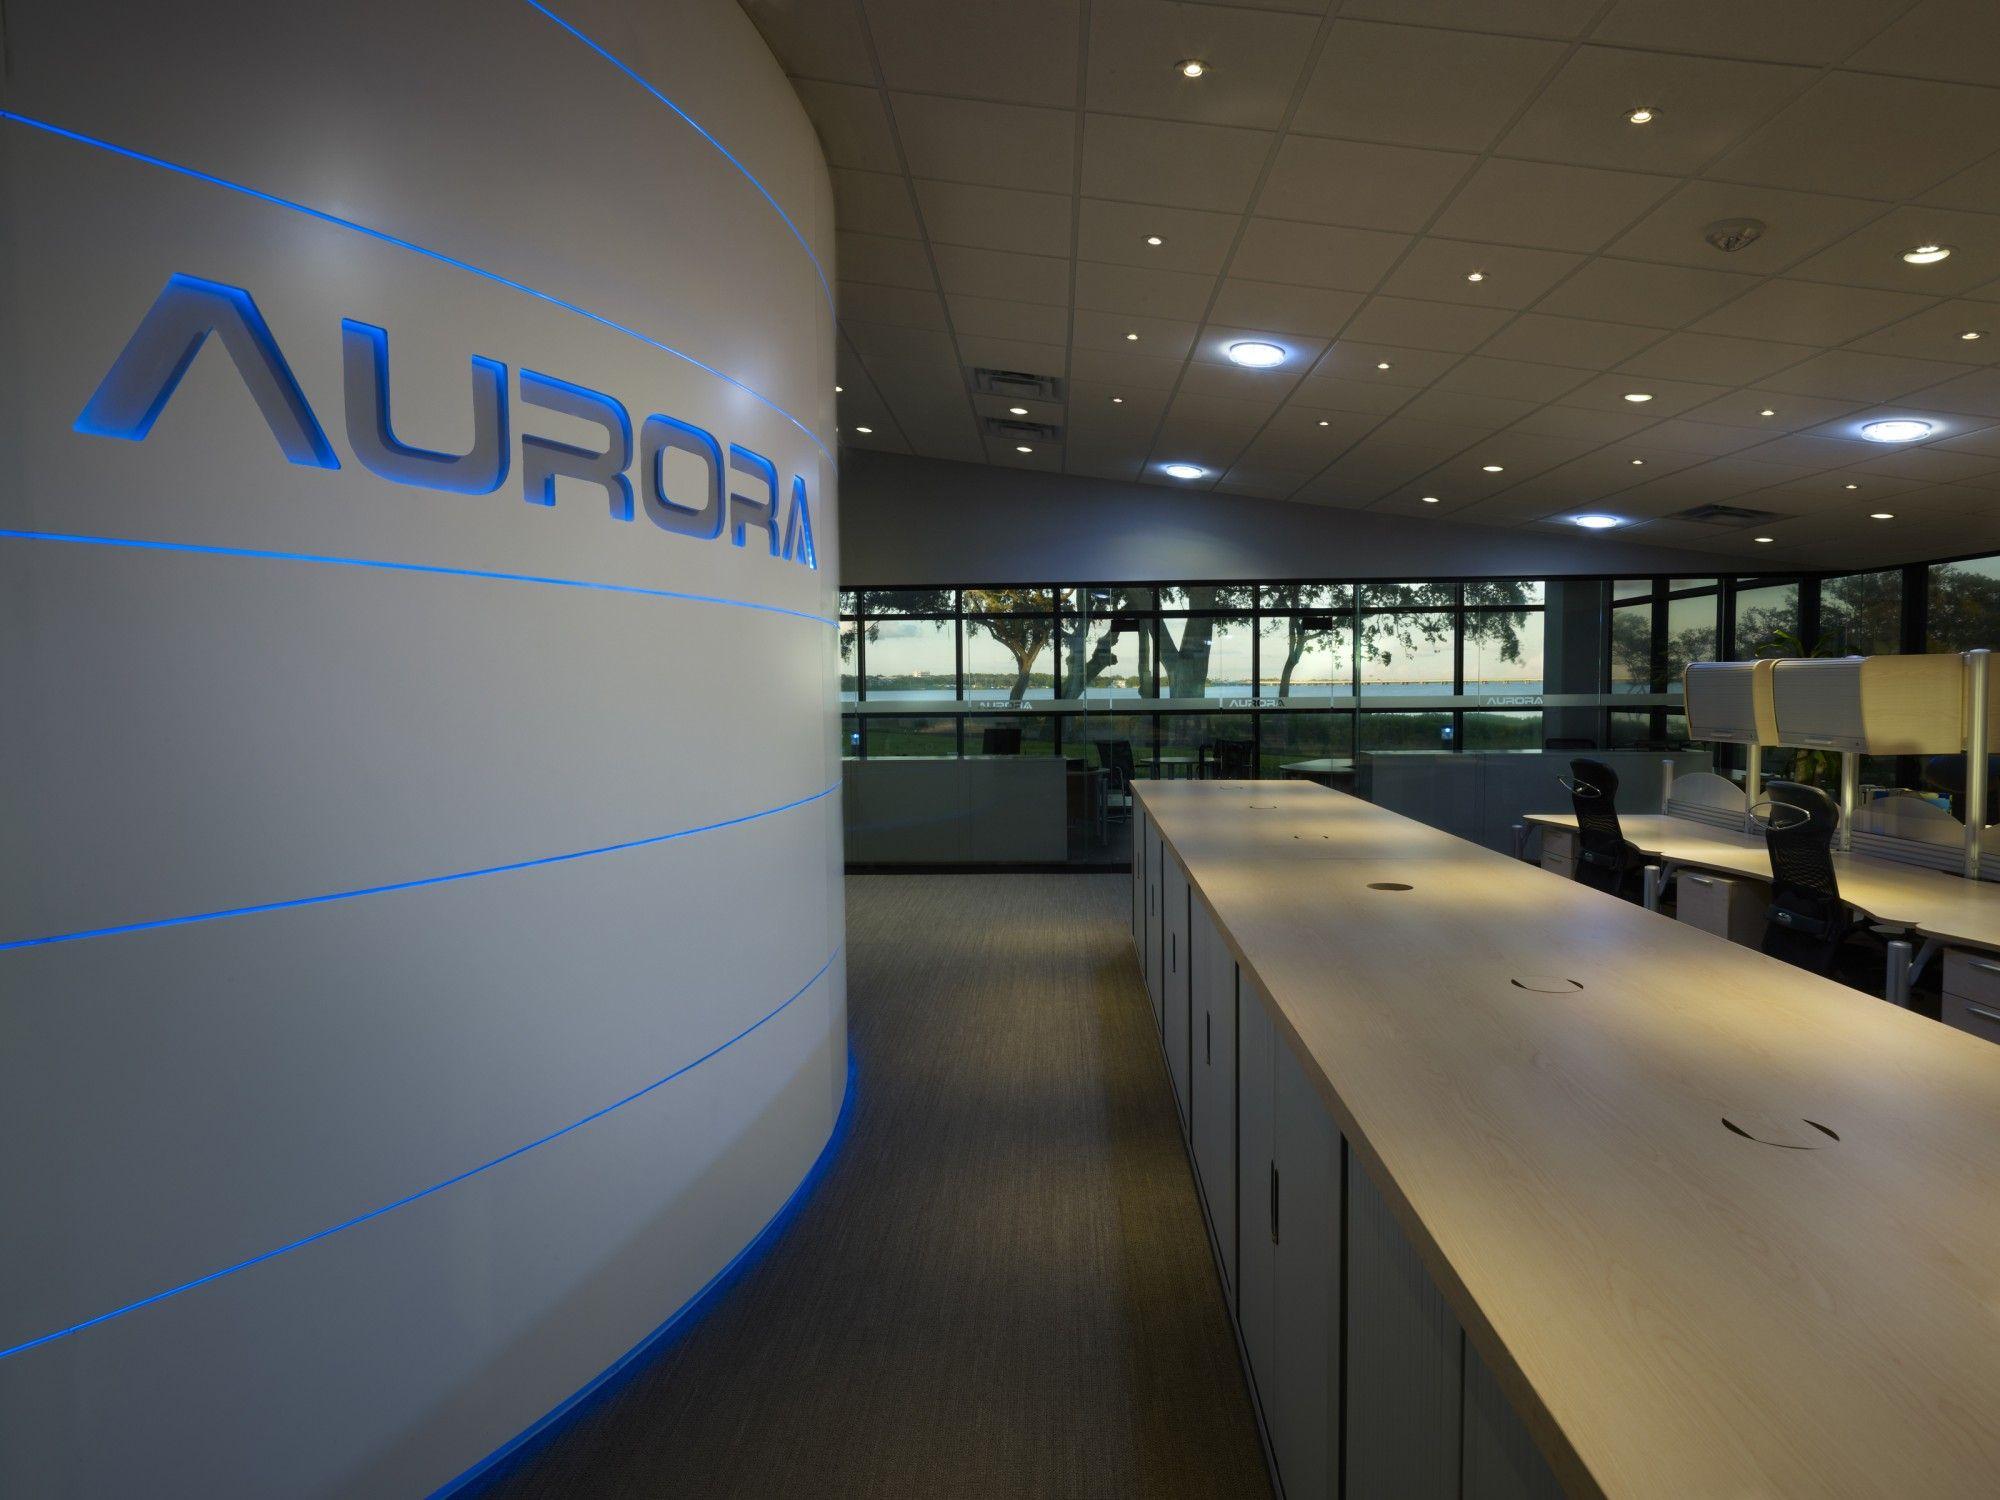 aurora_corporate_logowall.jpg